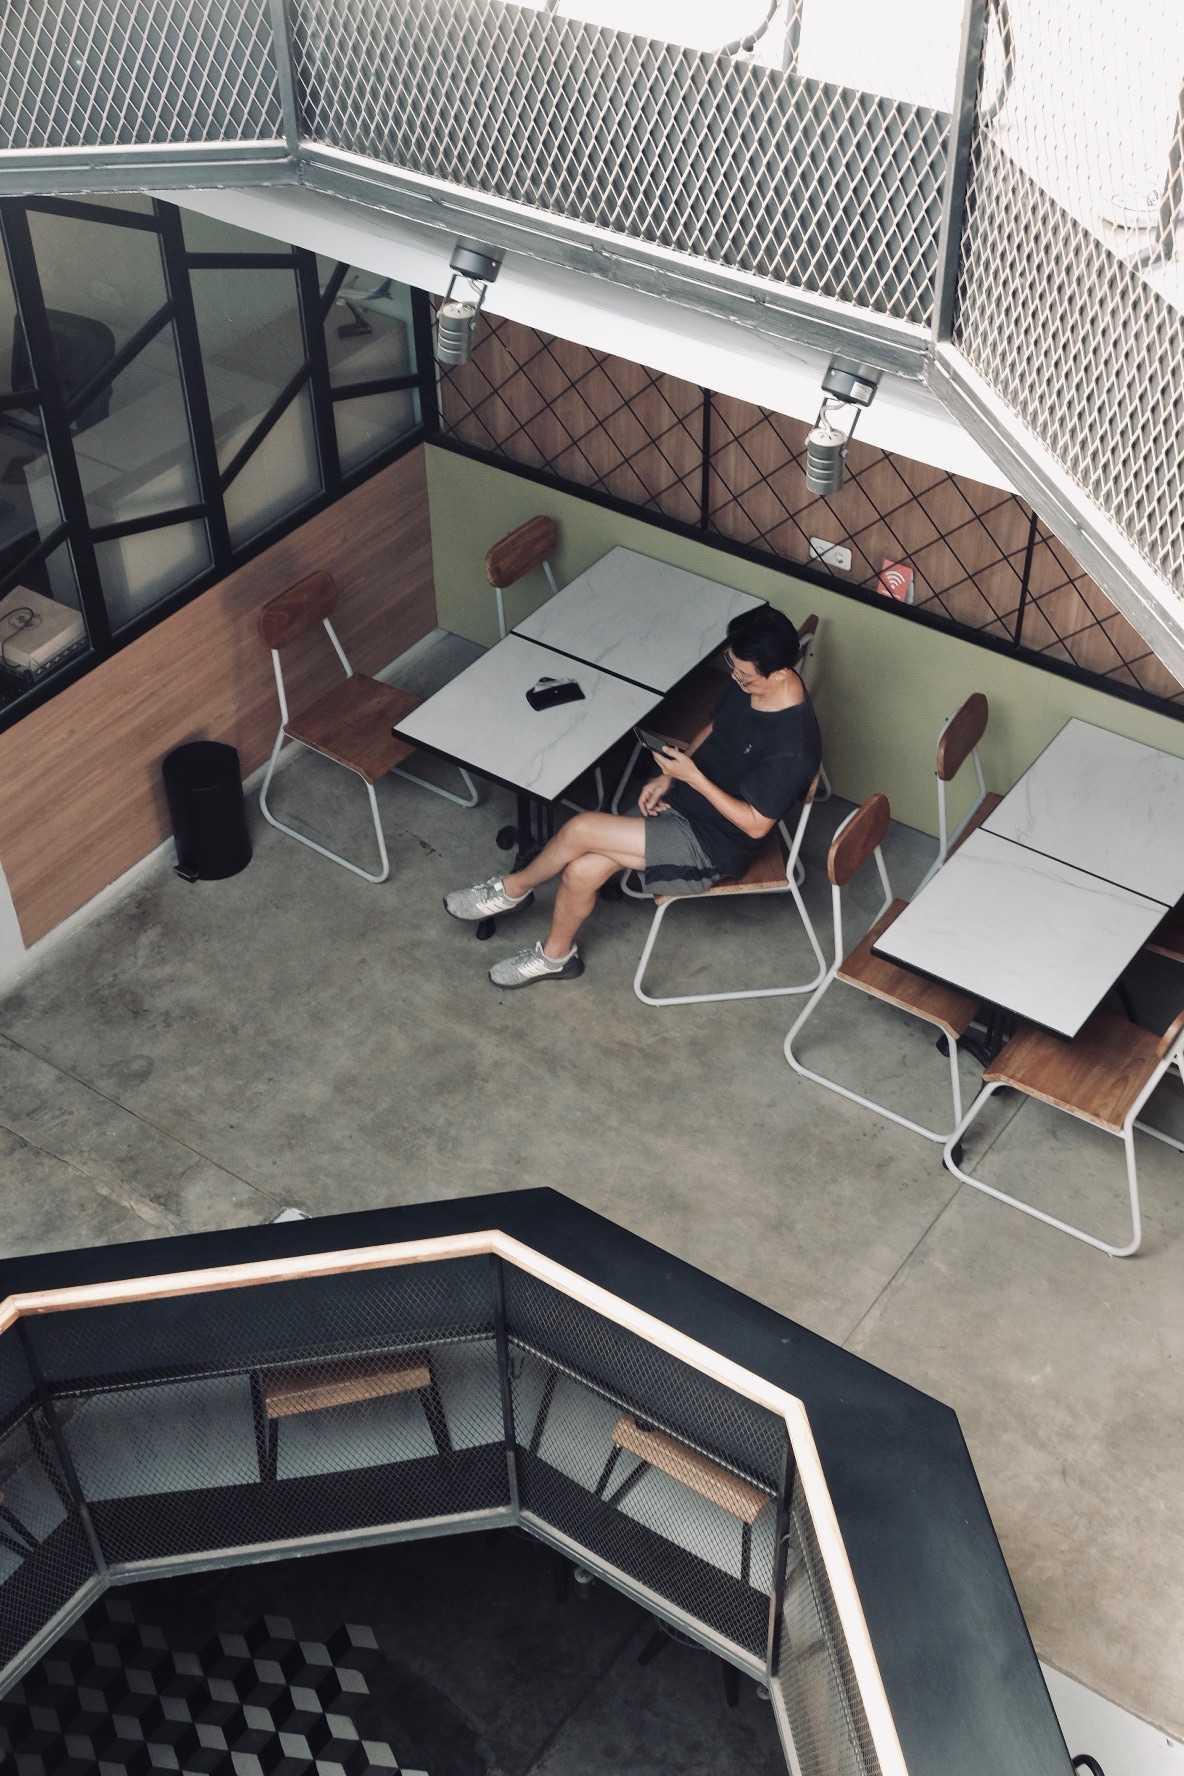 Dinardithen Studio Industrial Bakery House And Coffe At Paskal Bandung, Kota Bandung, Jawa Barat, Indonesia Bandung, Kota Bandung, Jawa Barat, Indonesia Dinardithen-Studio-Industrial-Bakery-House-And-Coffe-At-Paskal  127170